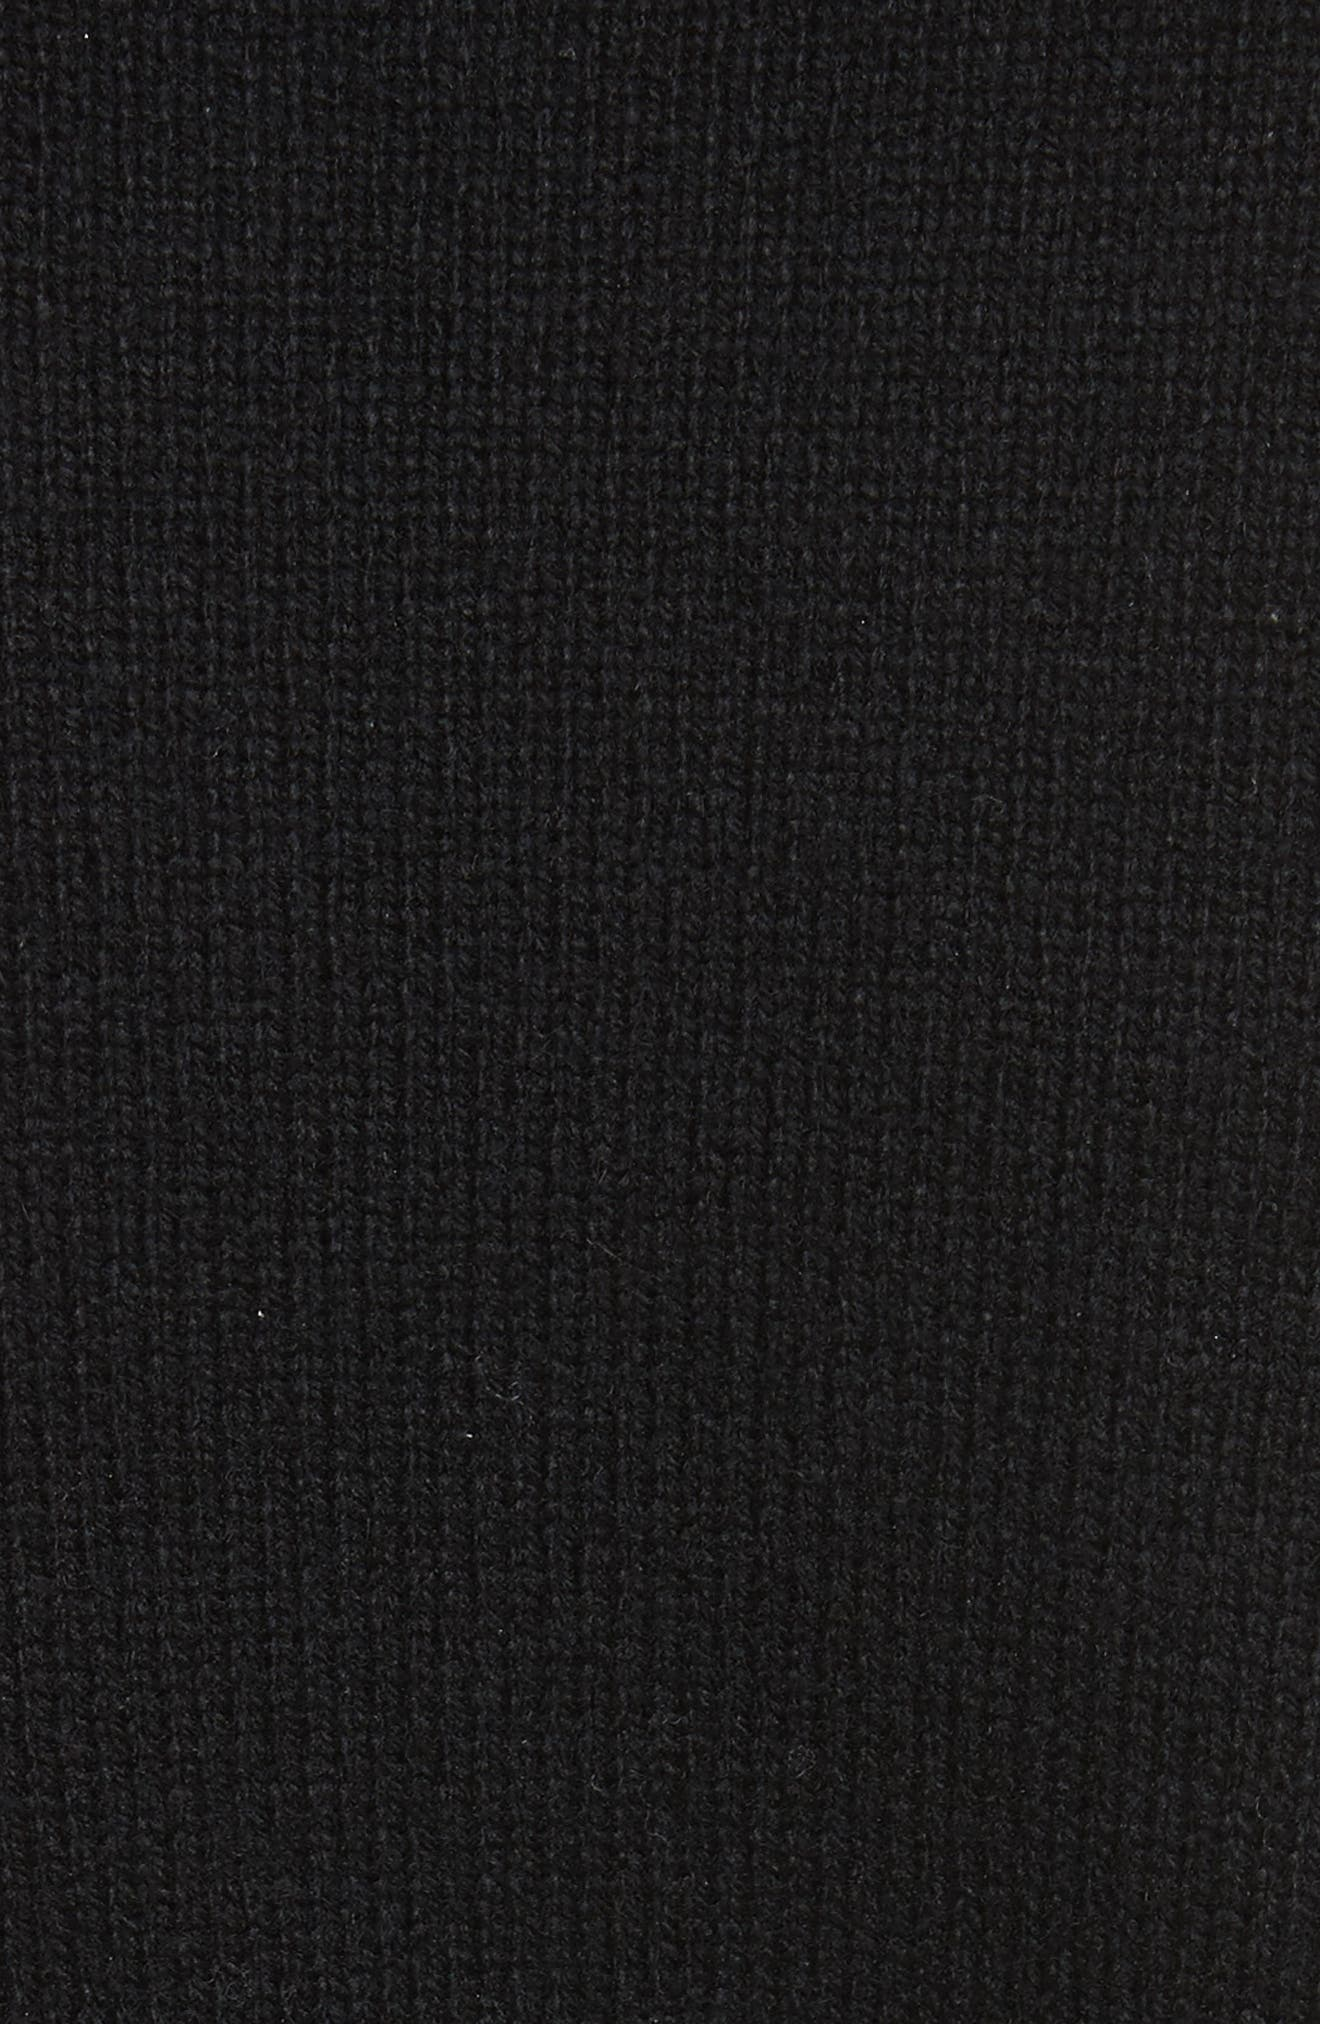 Lace Mix Cardigan,                             Alternate thumbnail 5, color,                             Black